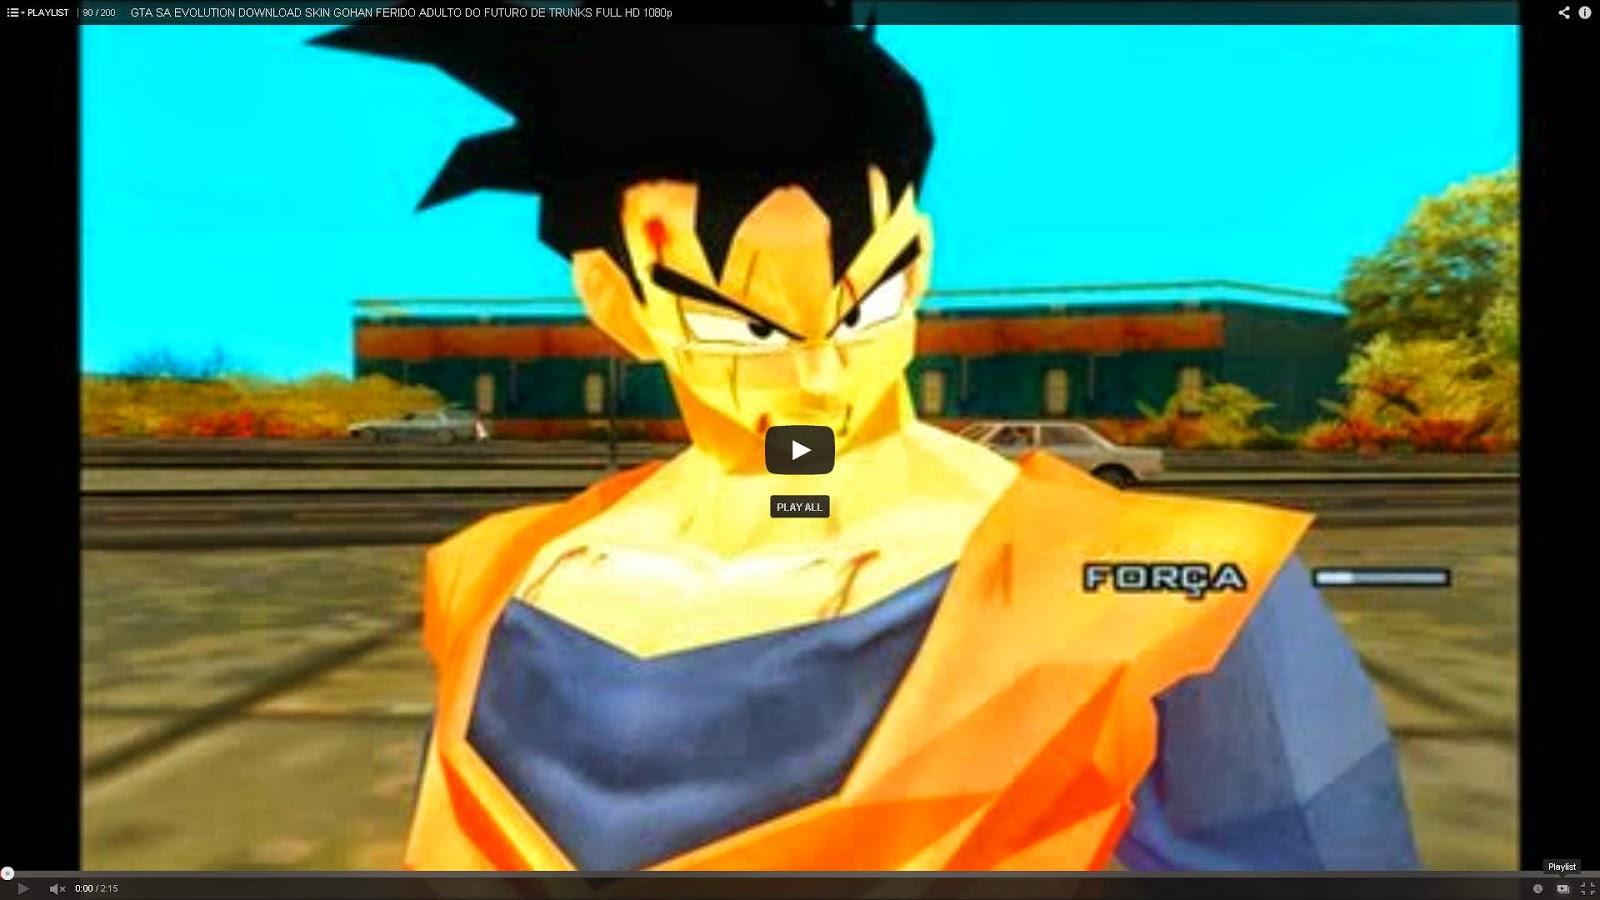 Gta San Andreas Pc Dragon Ball Z Mod Download - tartargraph's blog